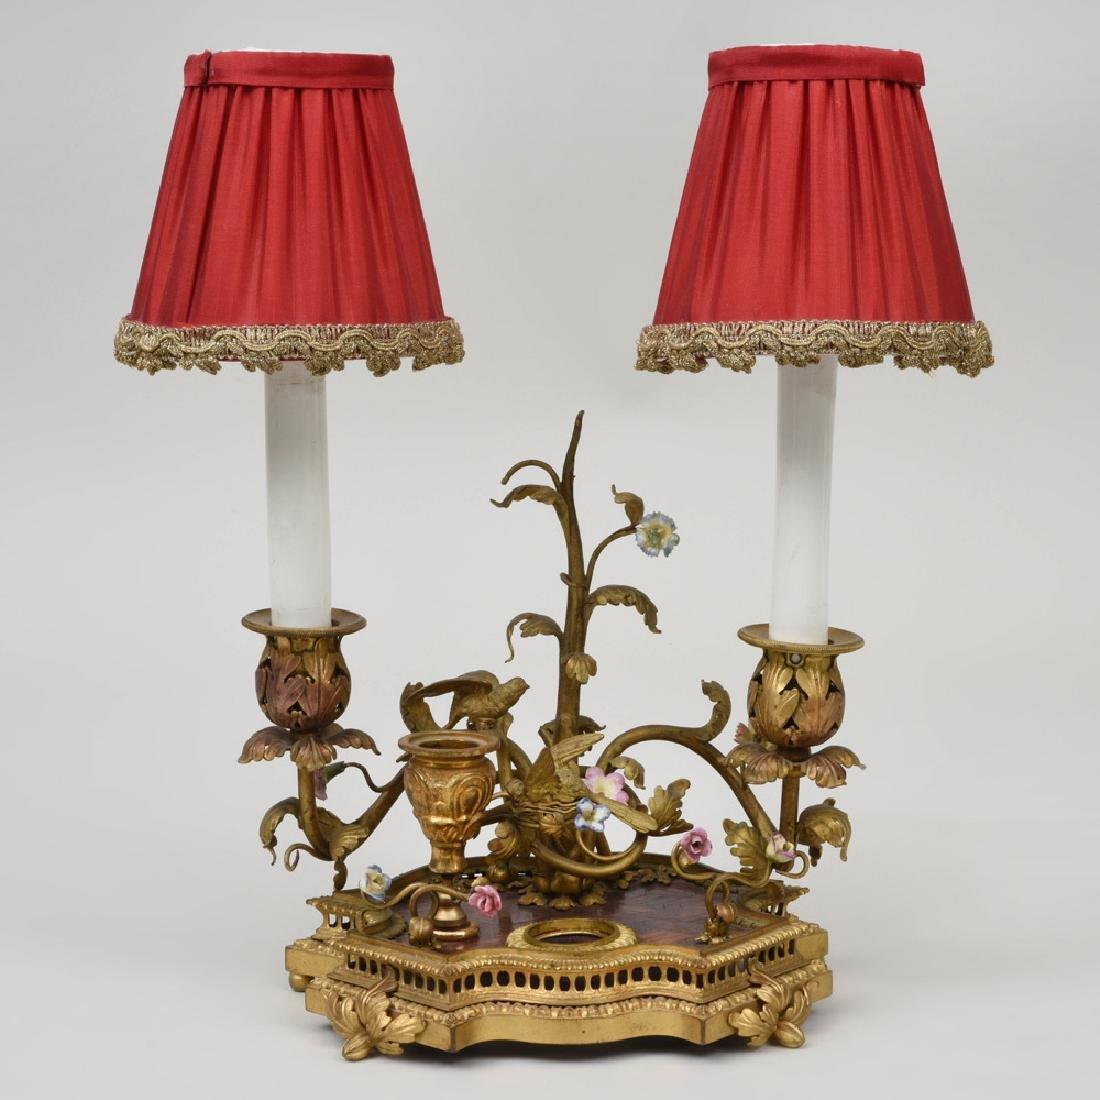 Louis XV Style Gilt-Bronze-Mounted Porcelain Encrier,